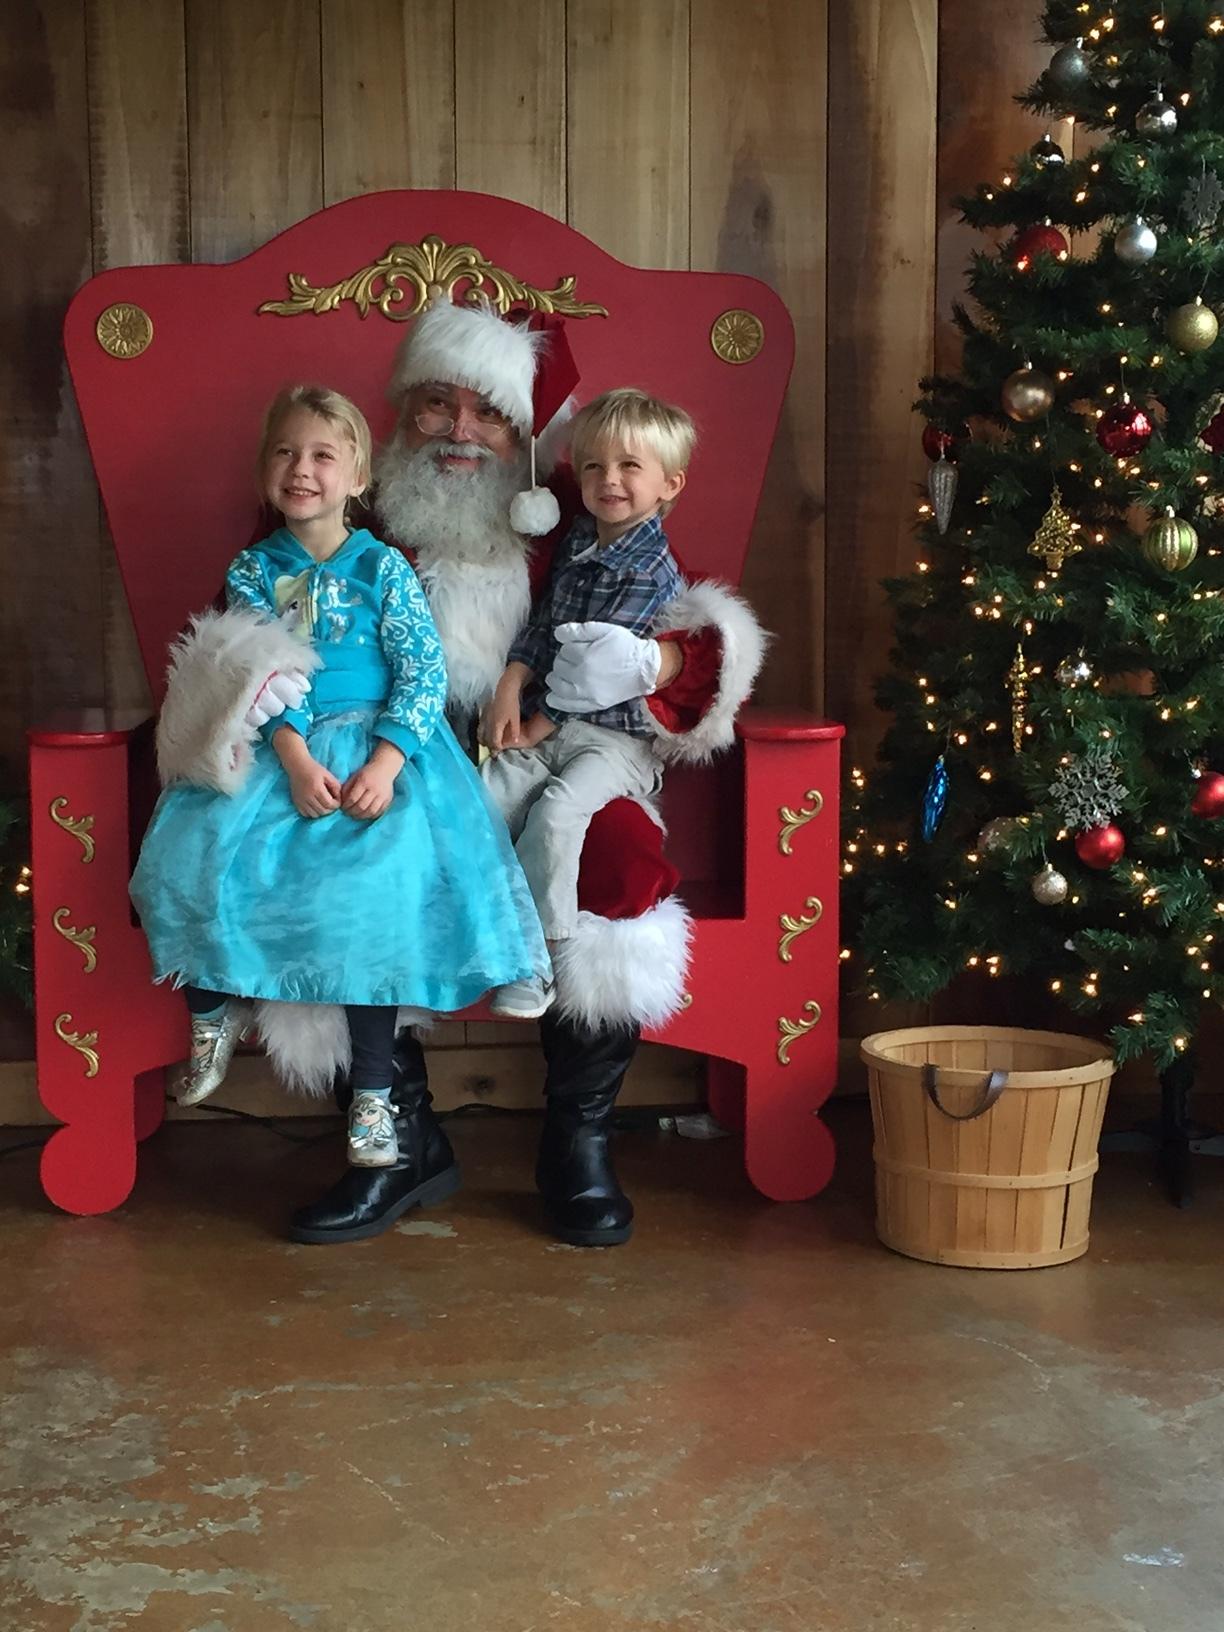 Meet Santa at Adventure Park USA!